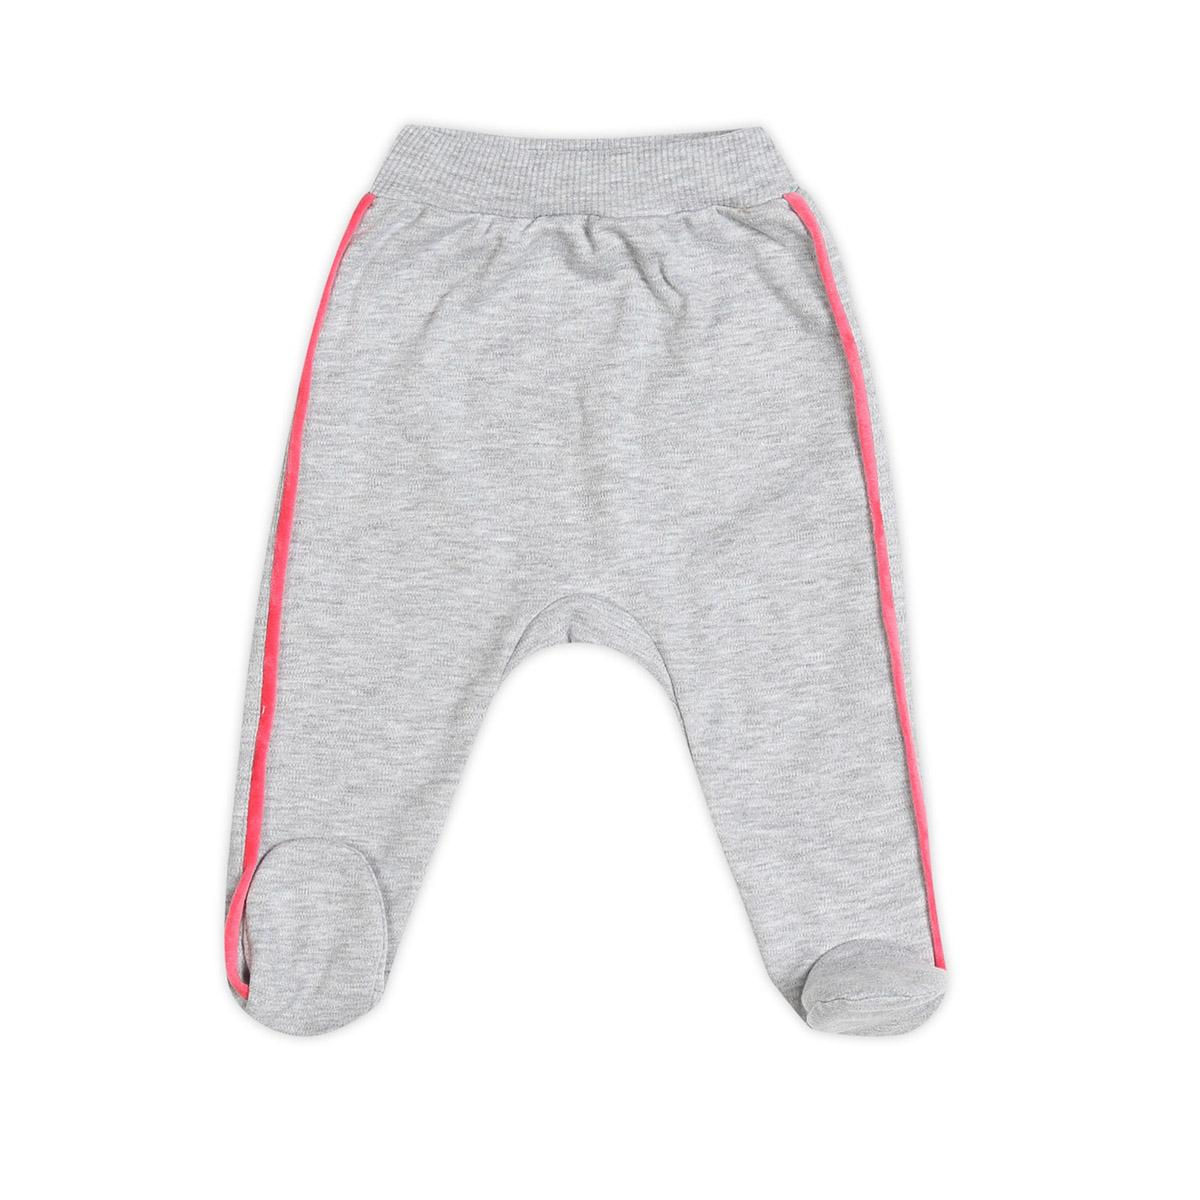 Ползунки с ножками Ёмаё Спорт (26-265) рост 68 серый меланж<br>